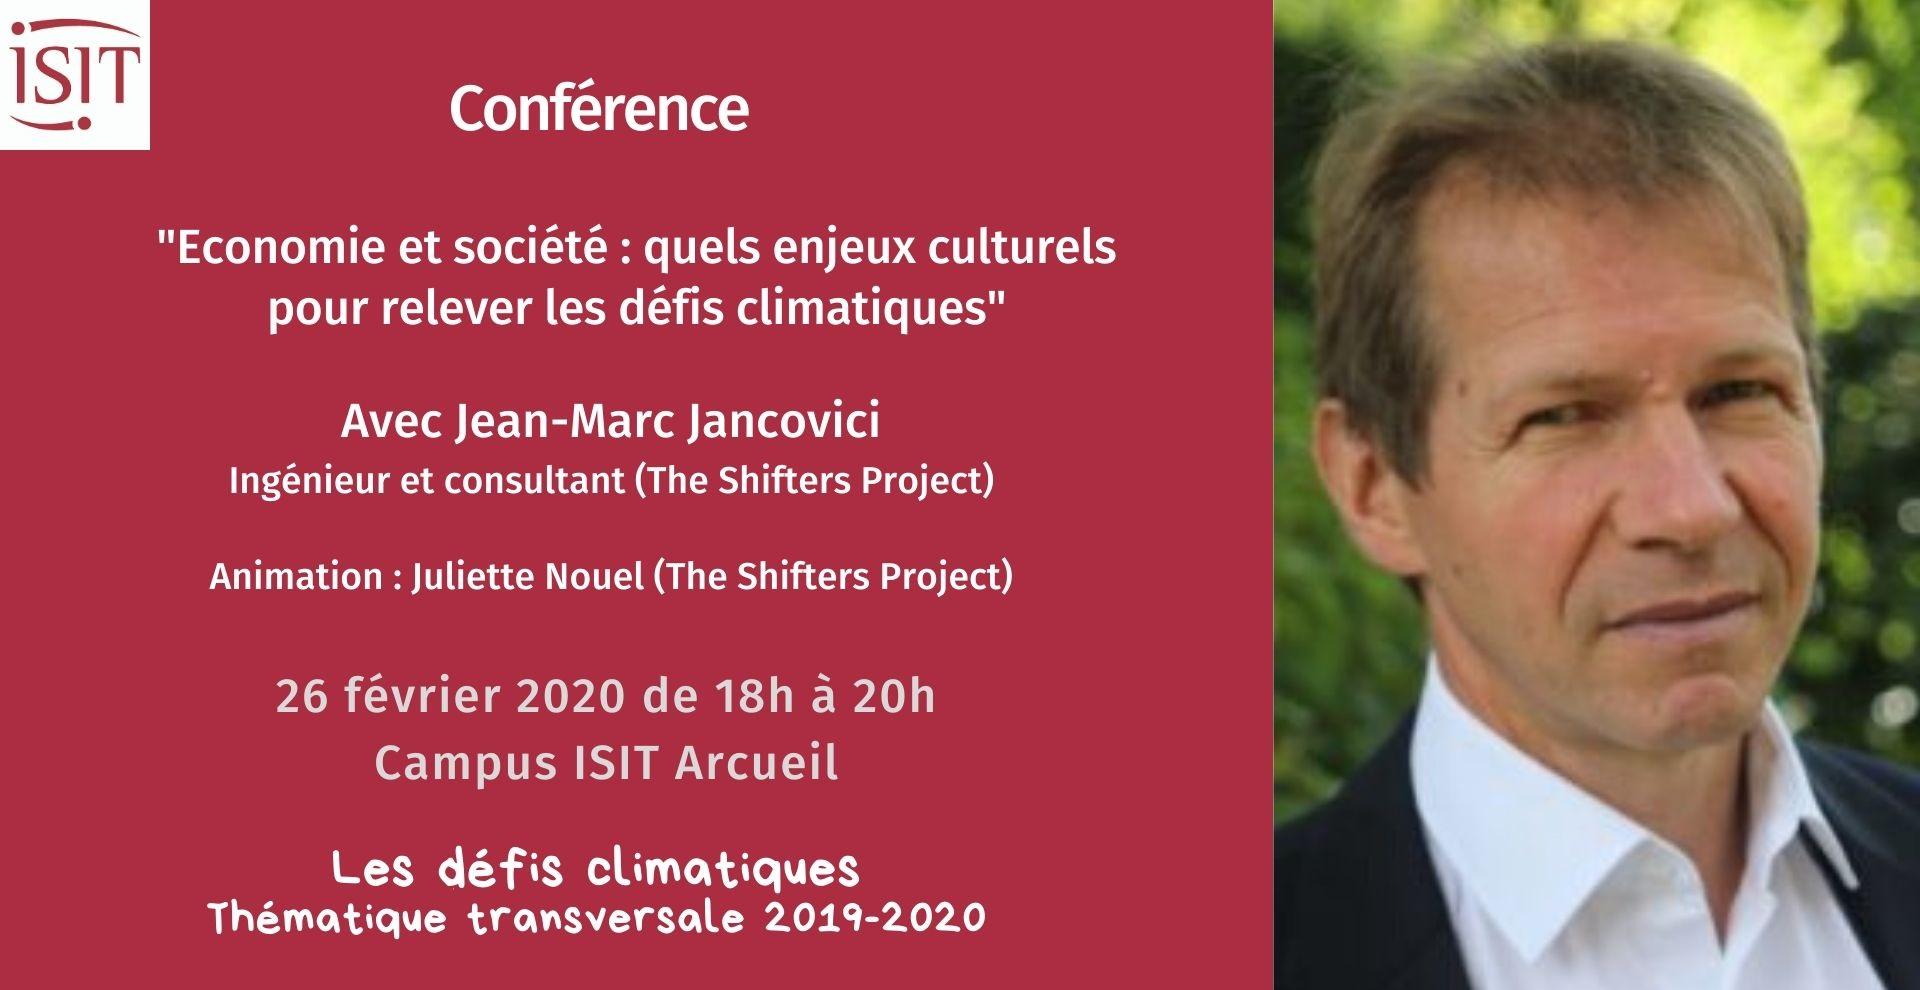 5è conférence climat avec Jean-Marc Jancovici